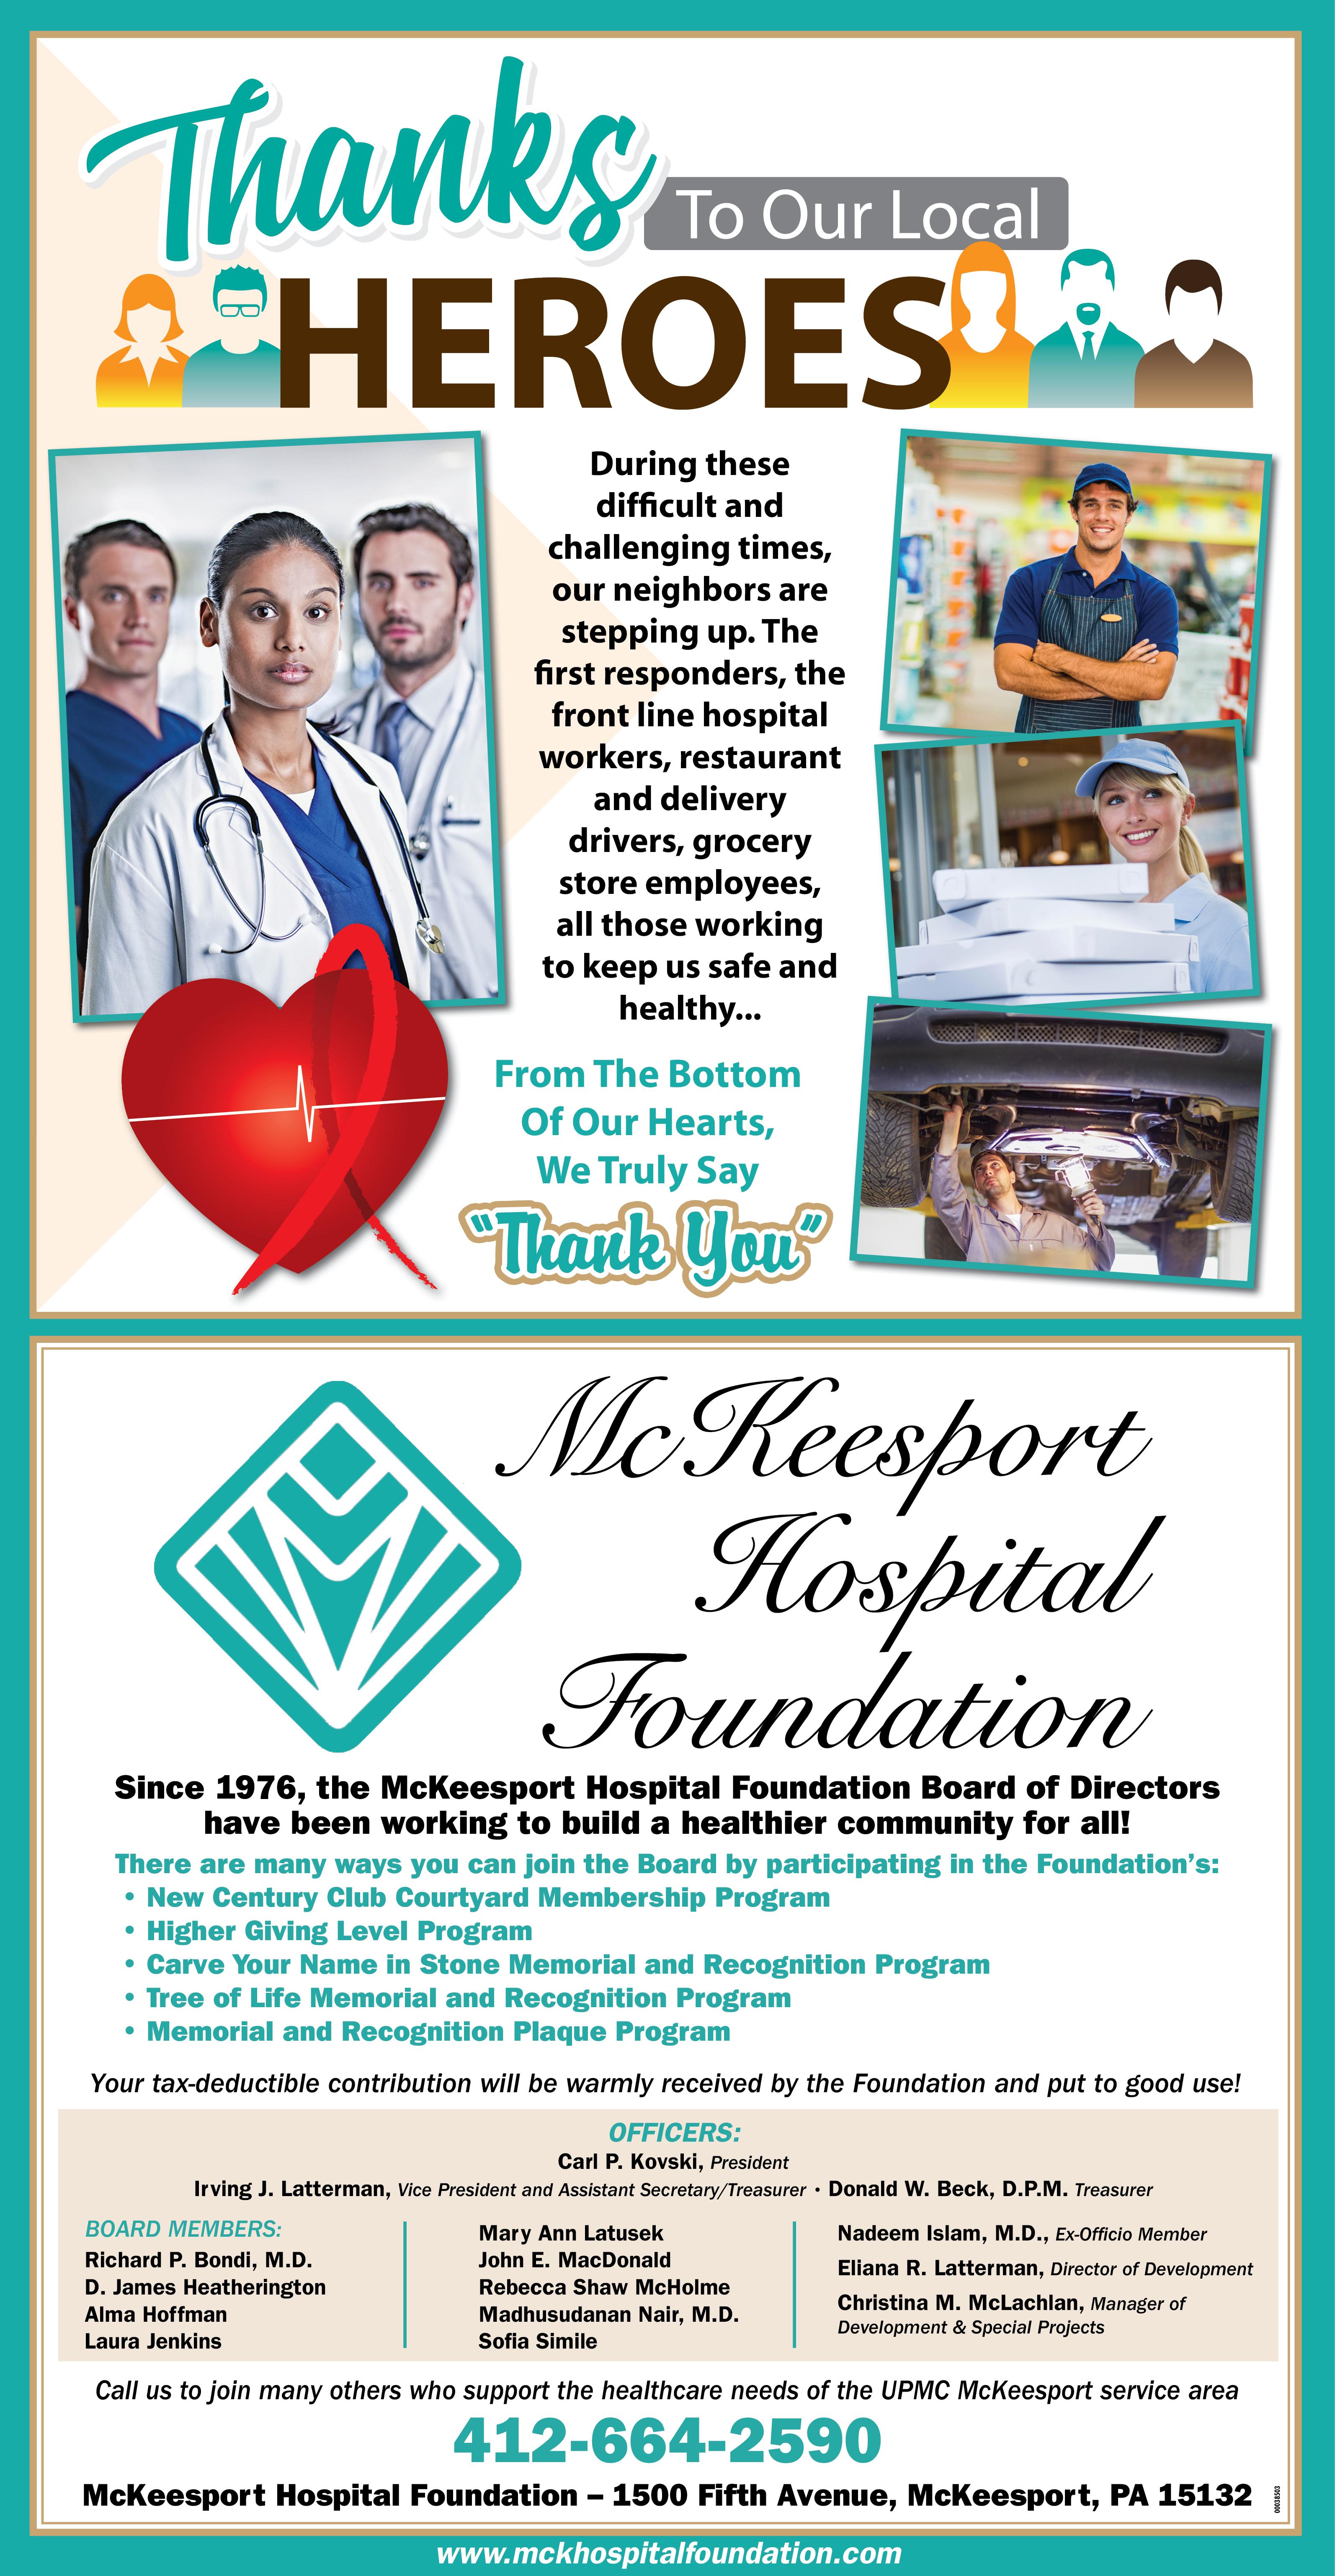 00038503_McKeesport Hospital Foundation_6x20.5_Thanks